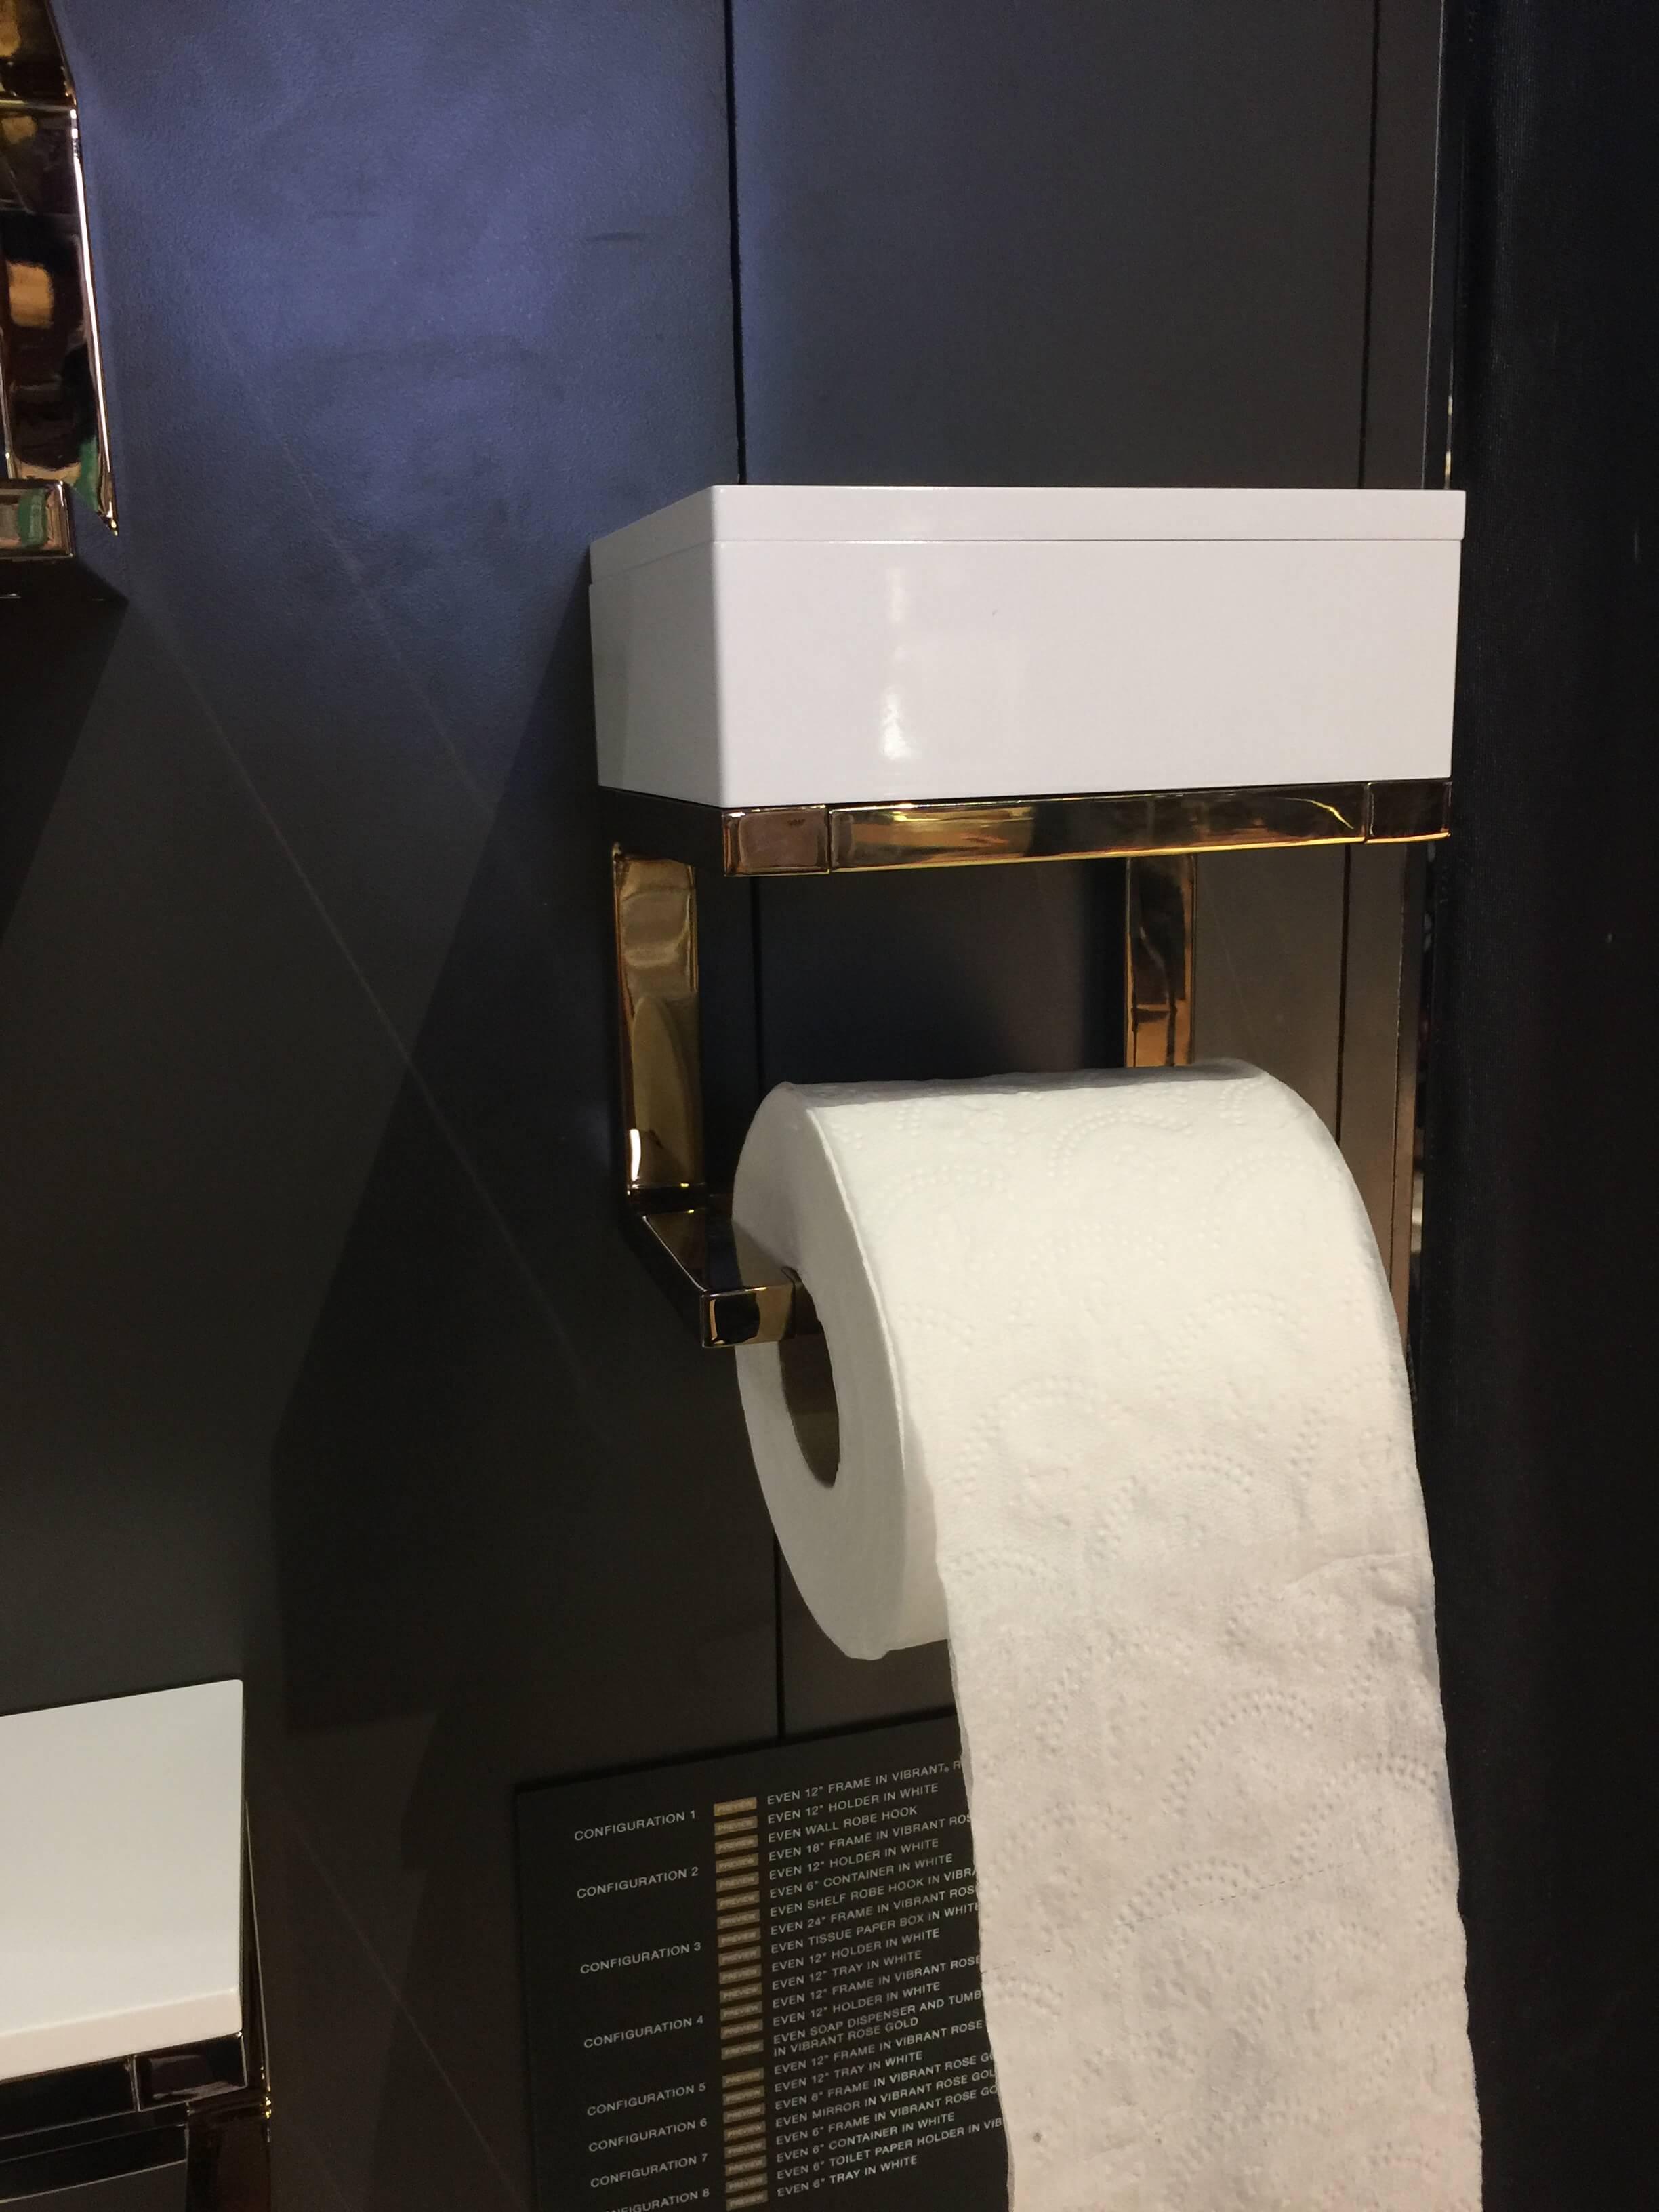 Toilet paper holder from Kohler #toiletpaperholder #bathroomaccessories